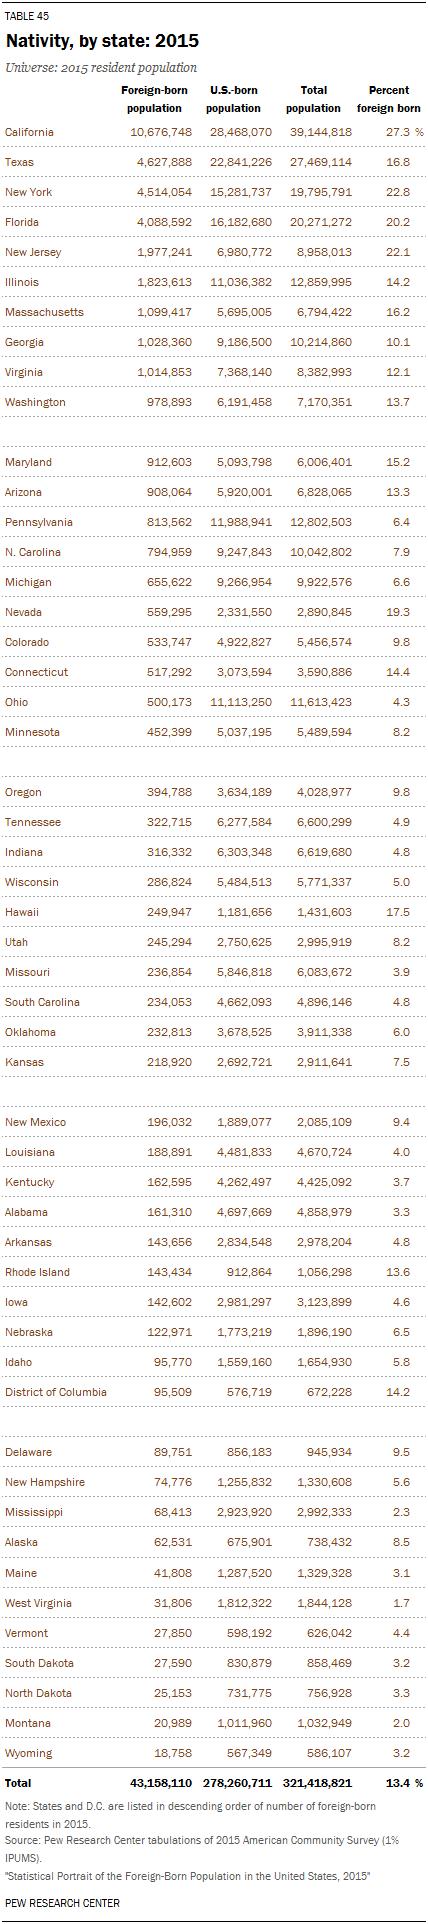 Nativity, by state: 2015